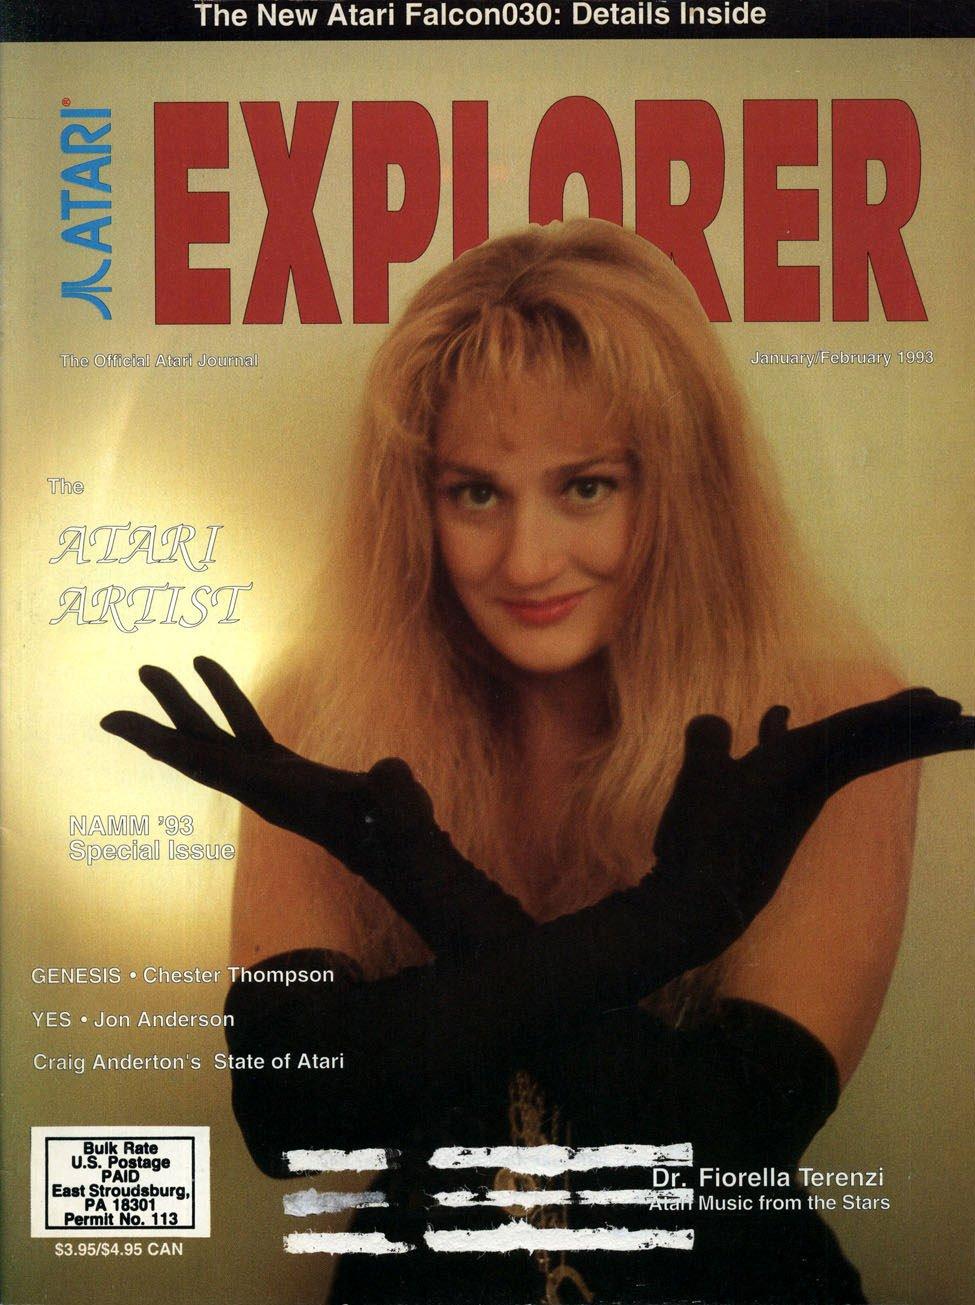 Atari Explorer Issue 36 (January / February 1993)